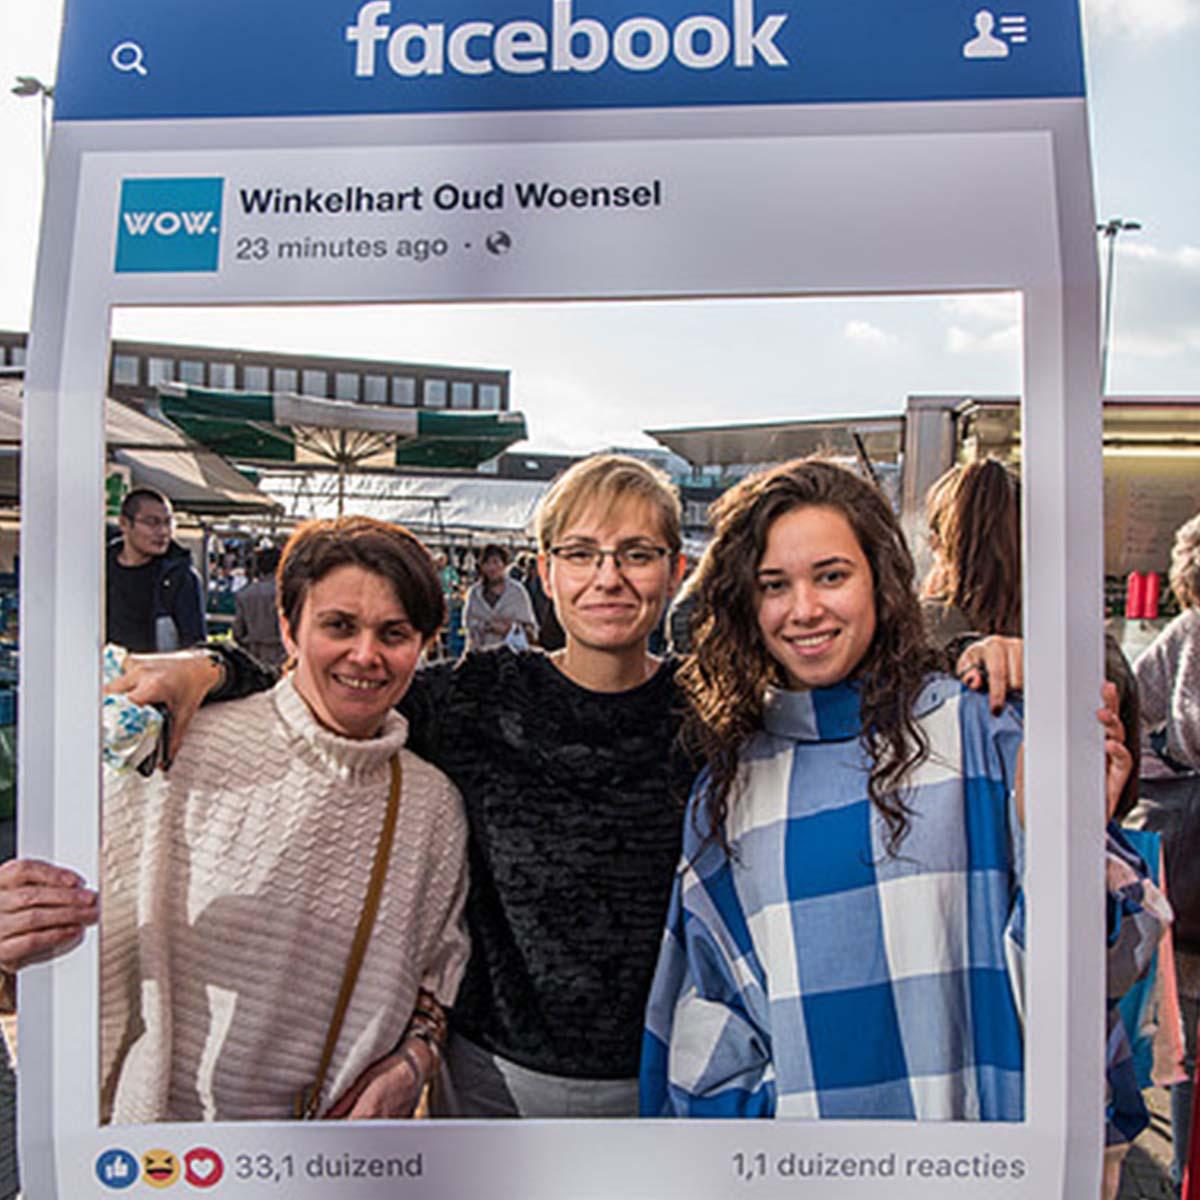 Winkelhart Oud Woensel fotoactie centrum WOW